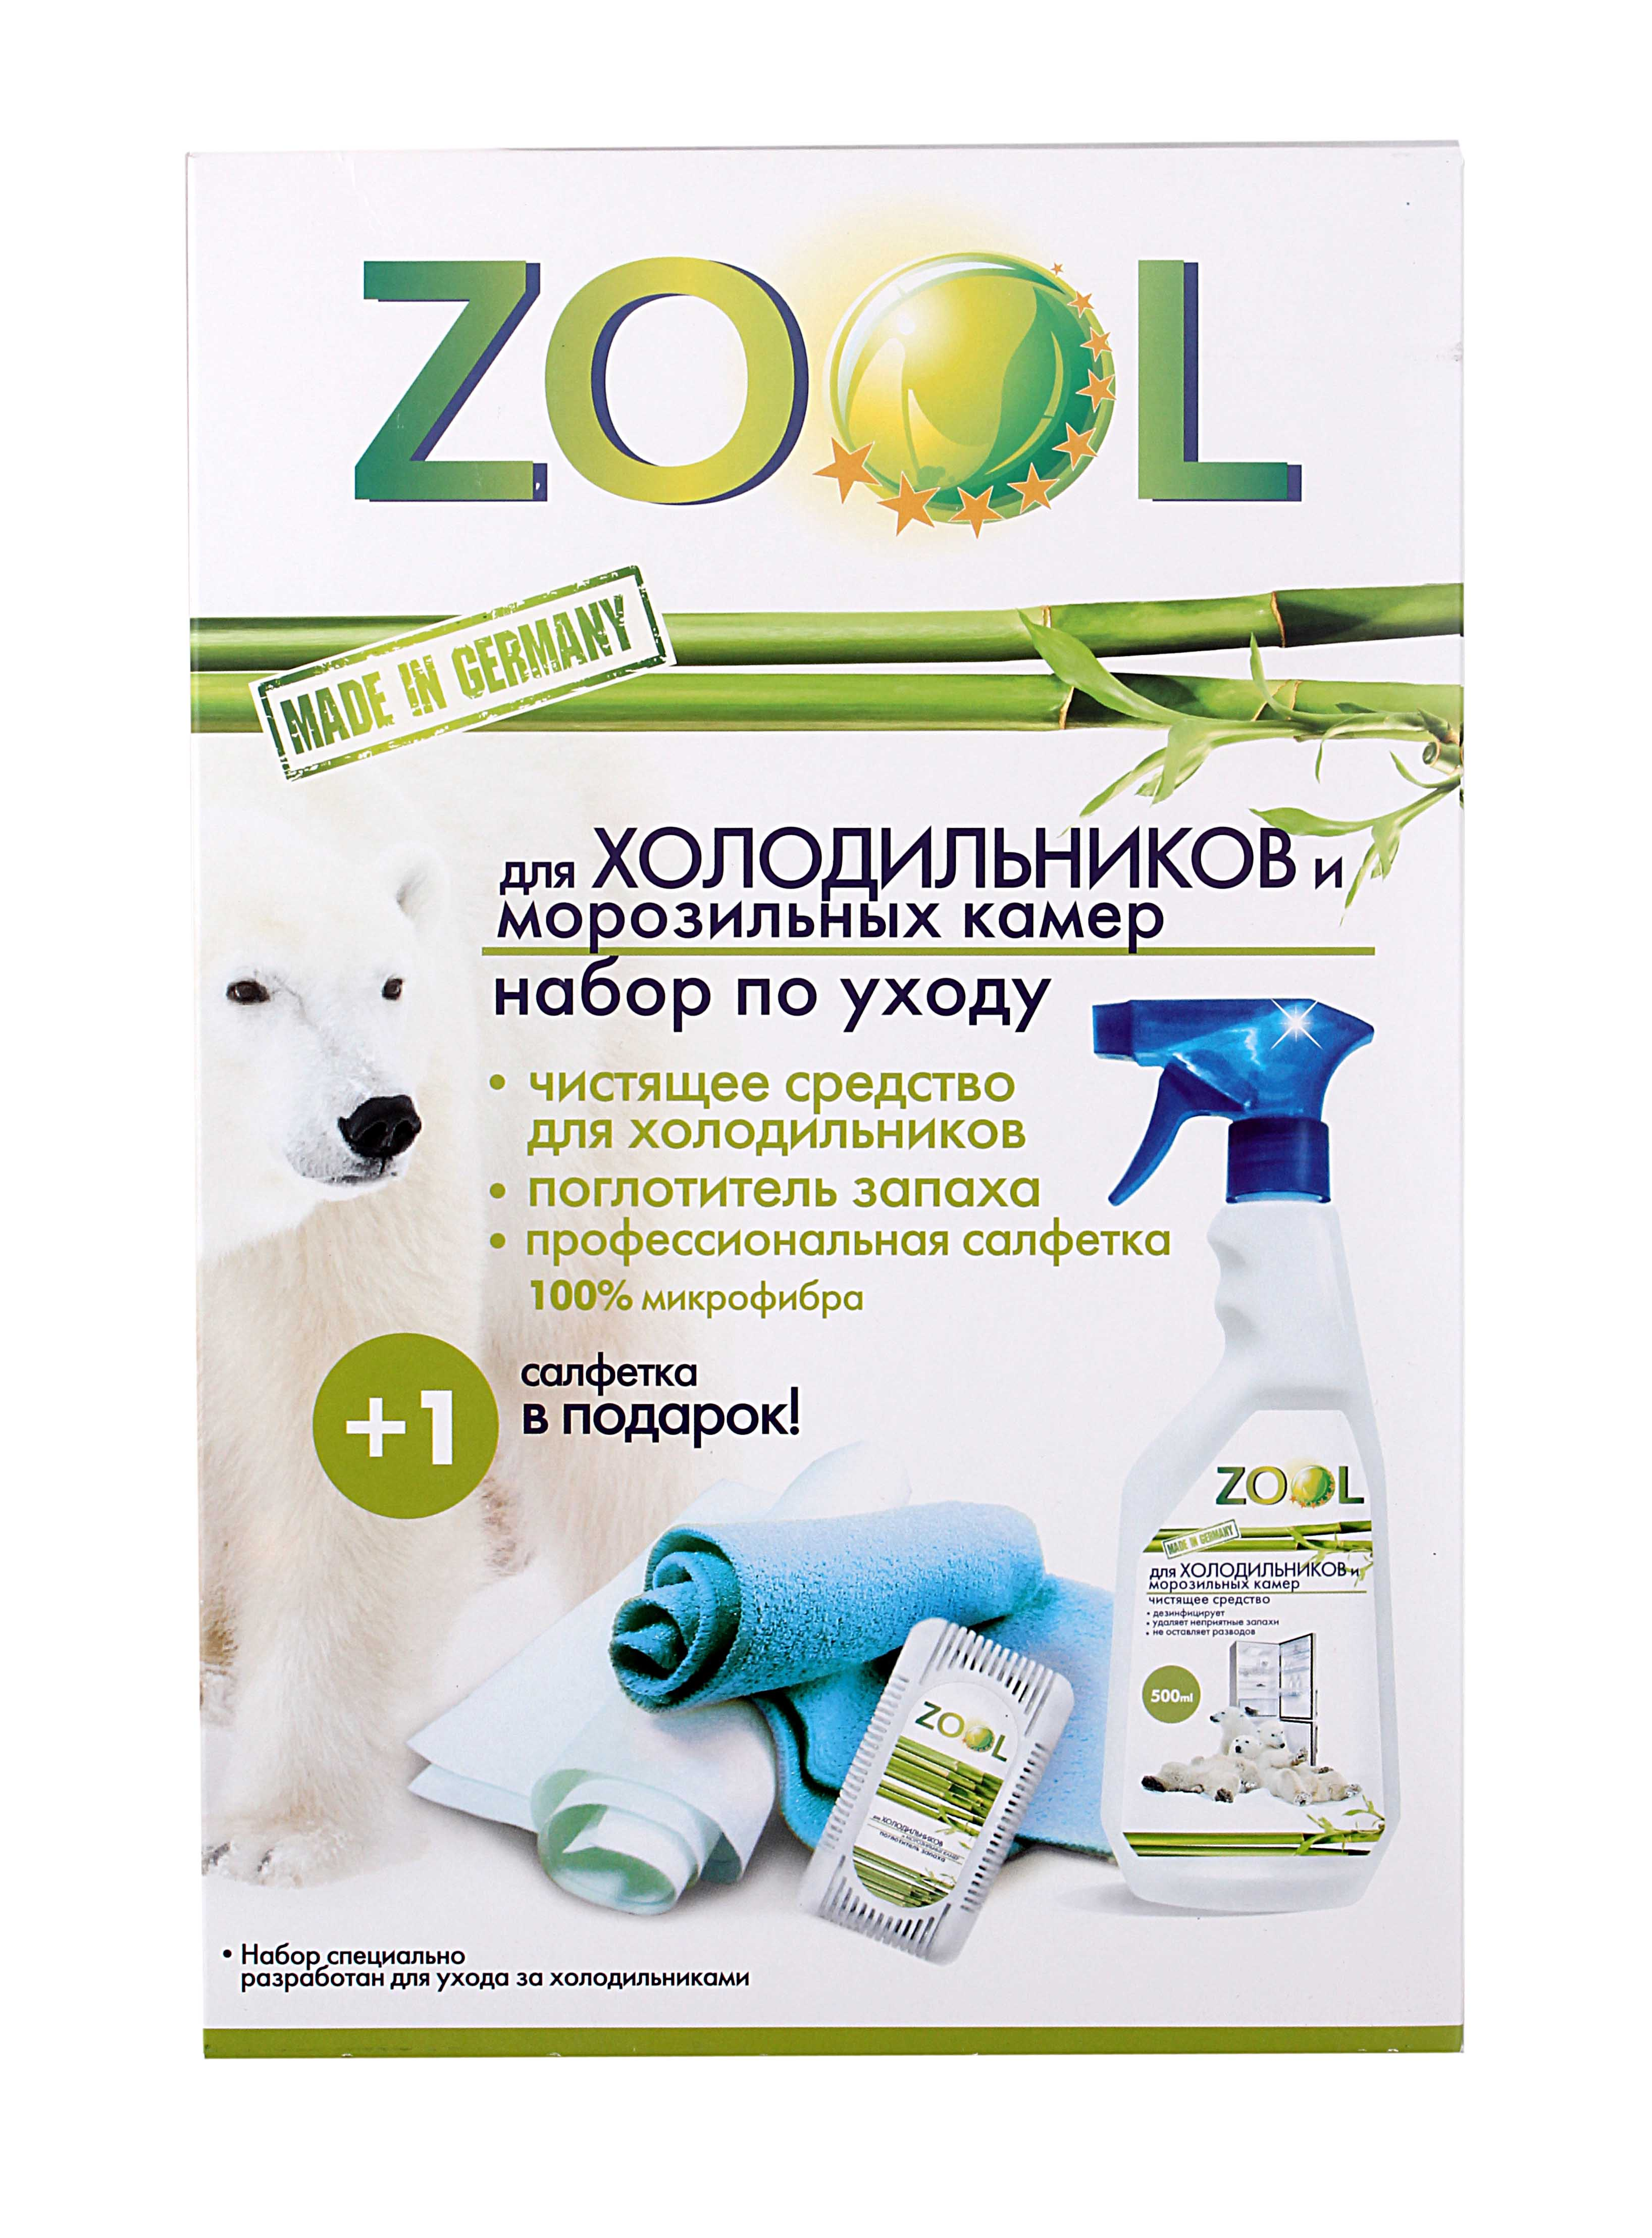 Аксессуары к холодильникам Zool Real Brand Technics 332.000